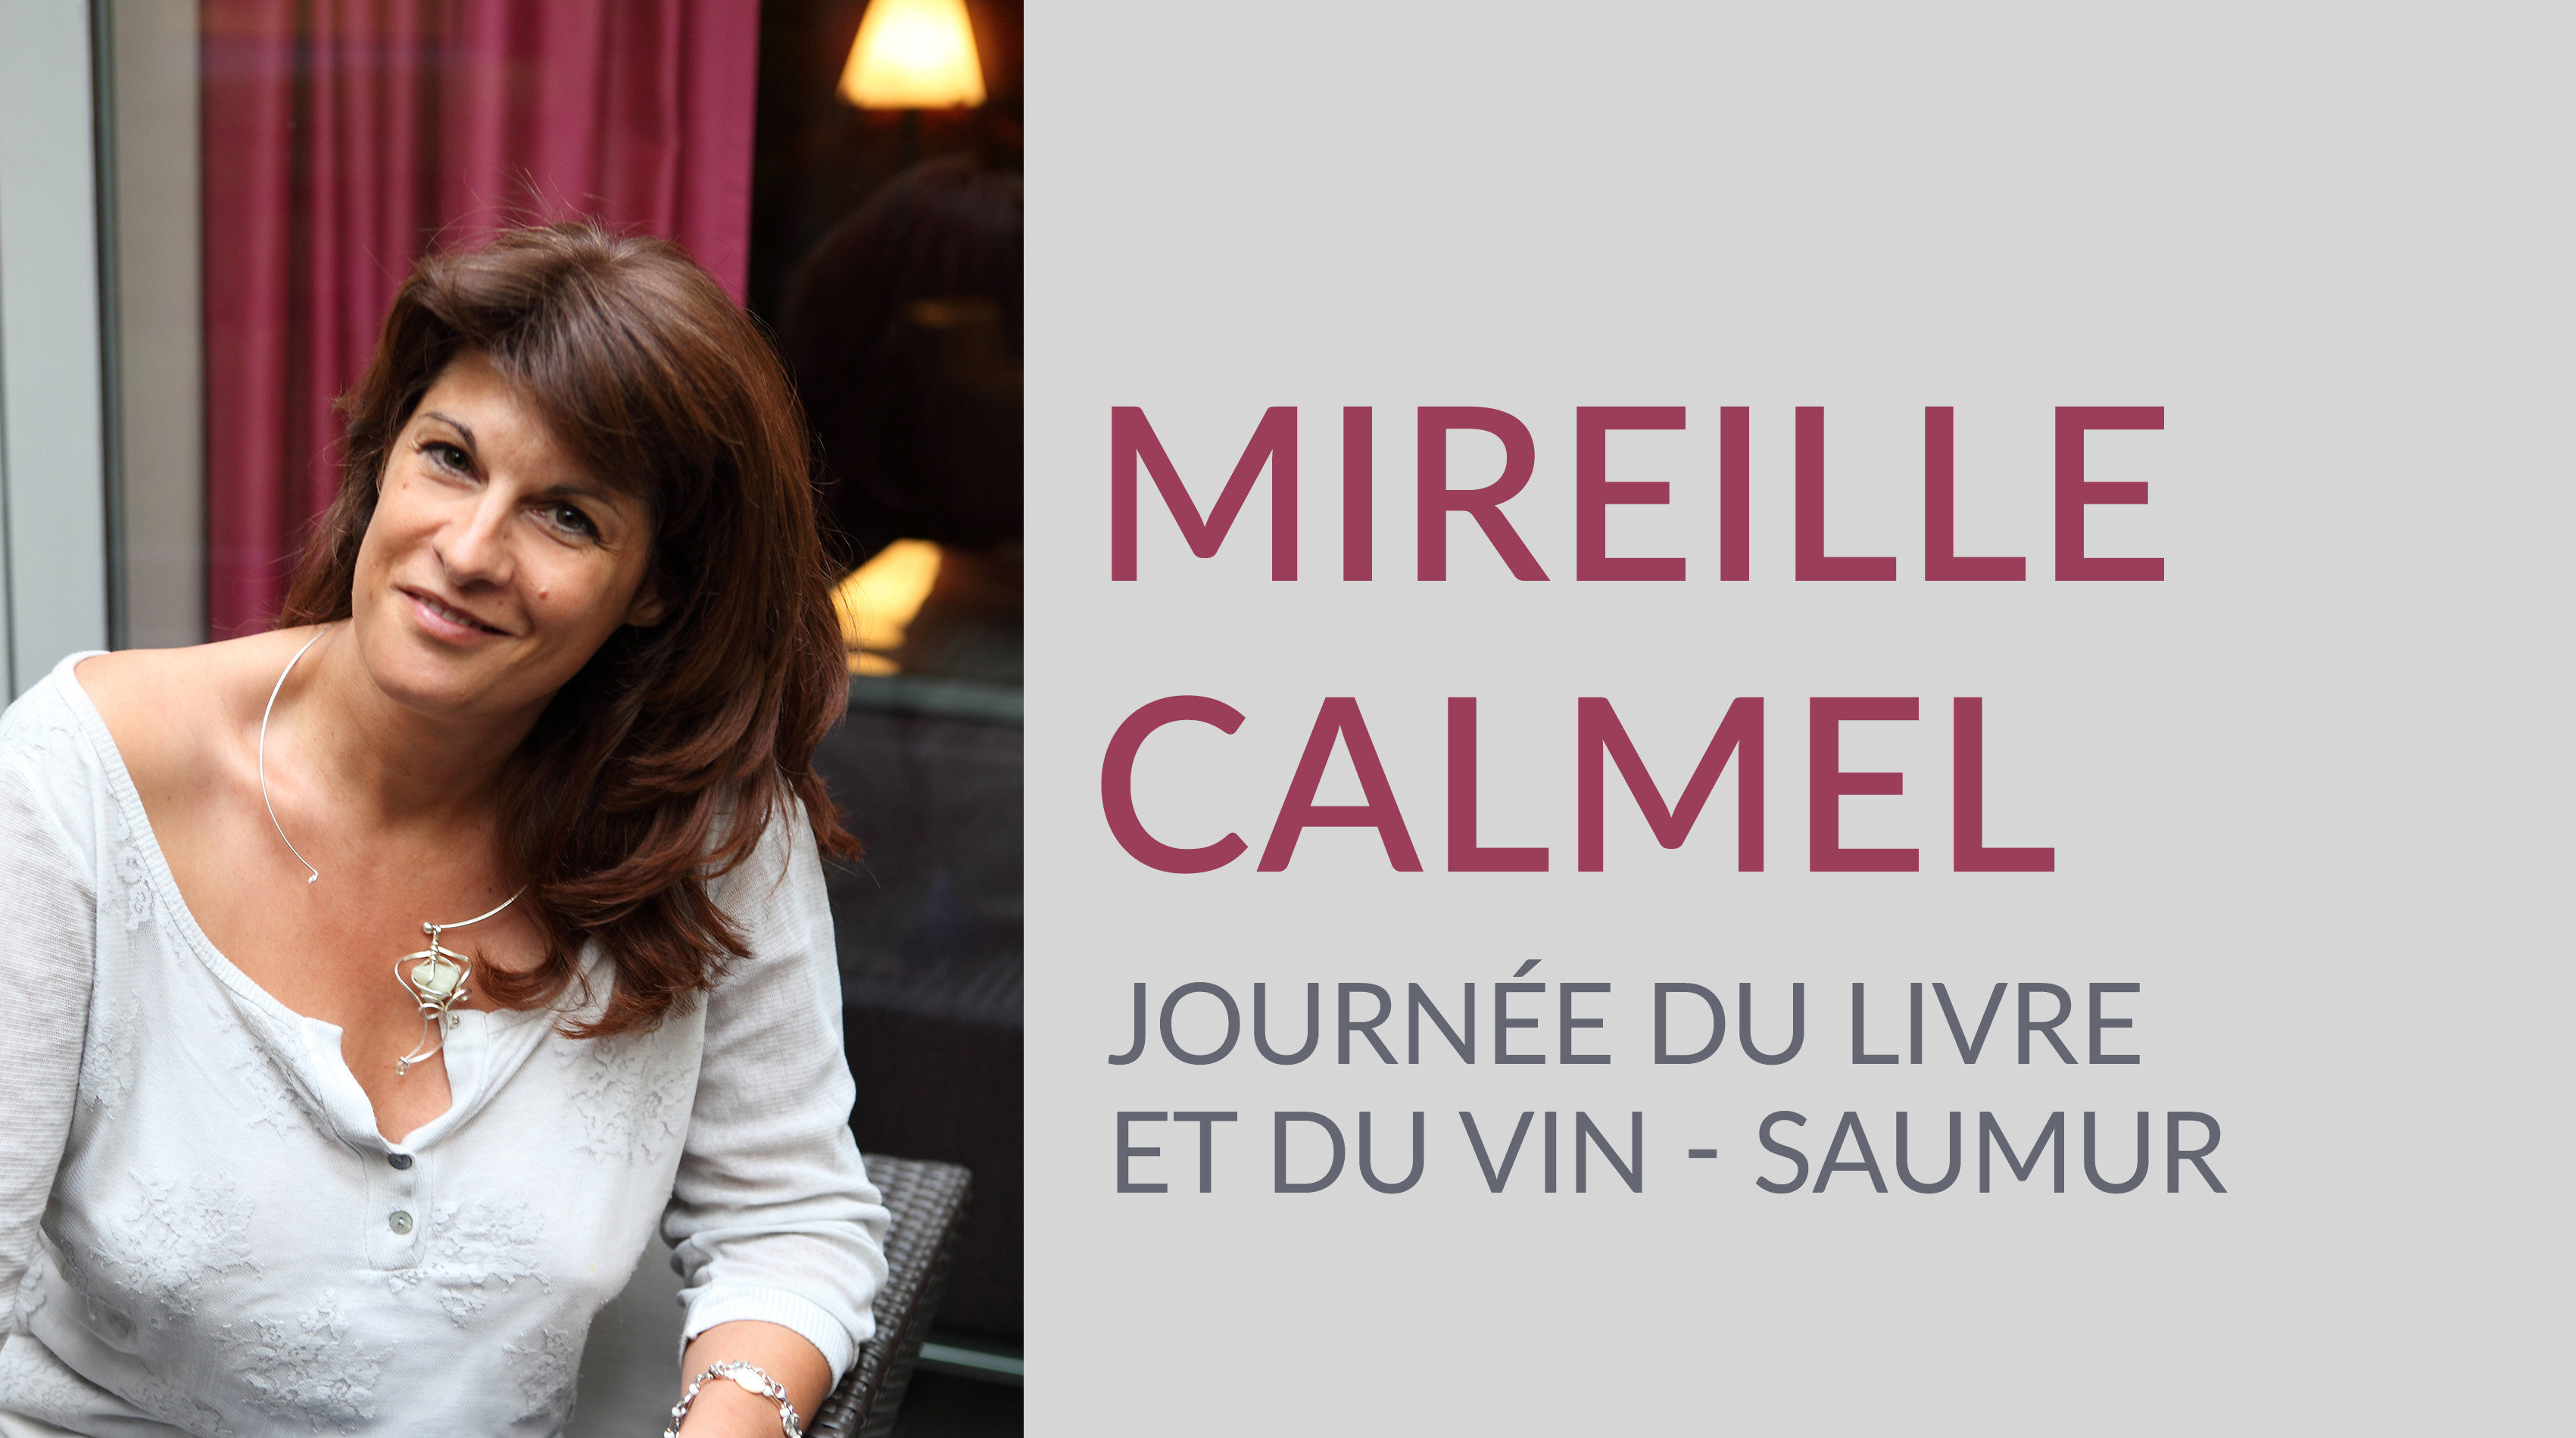 MIREILLE CALMEL À SAUMUR